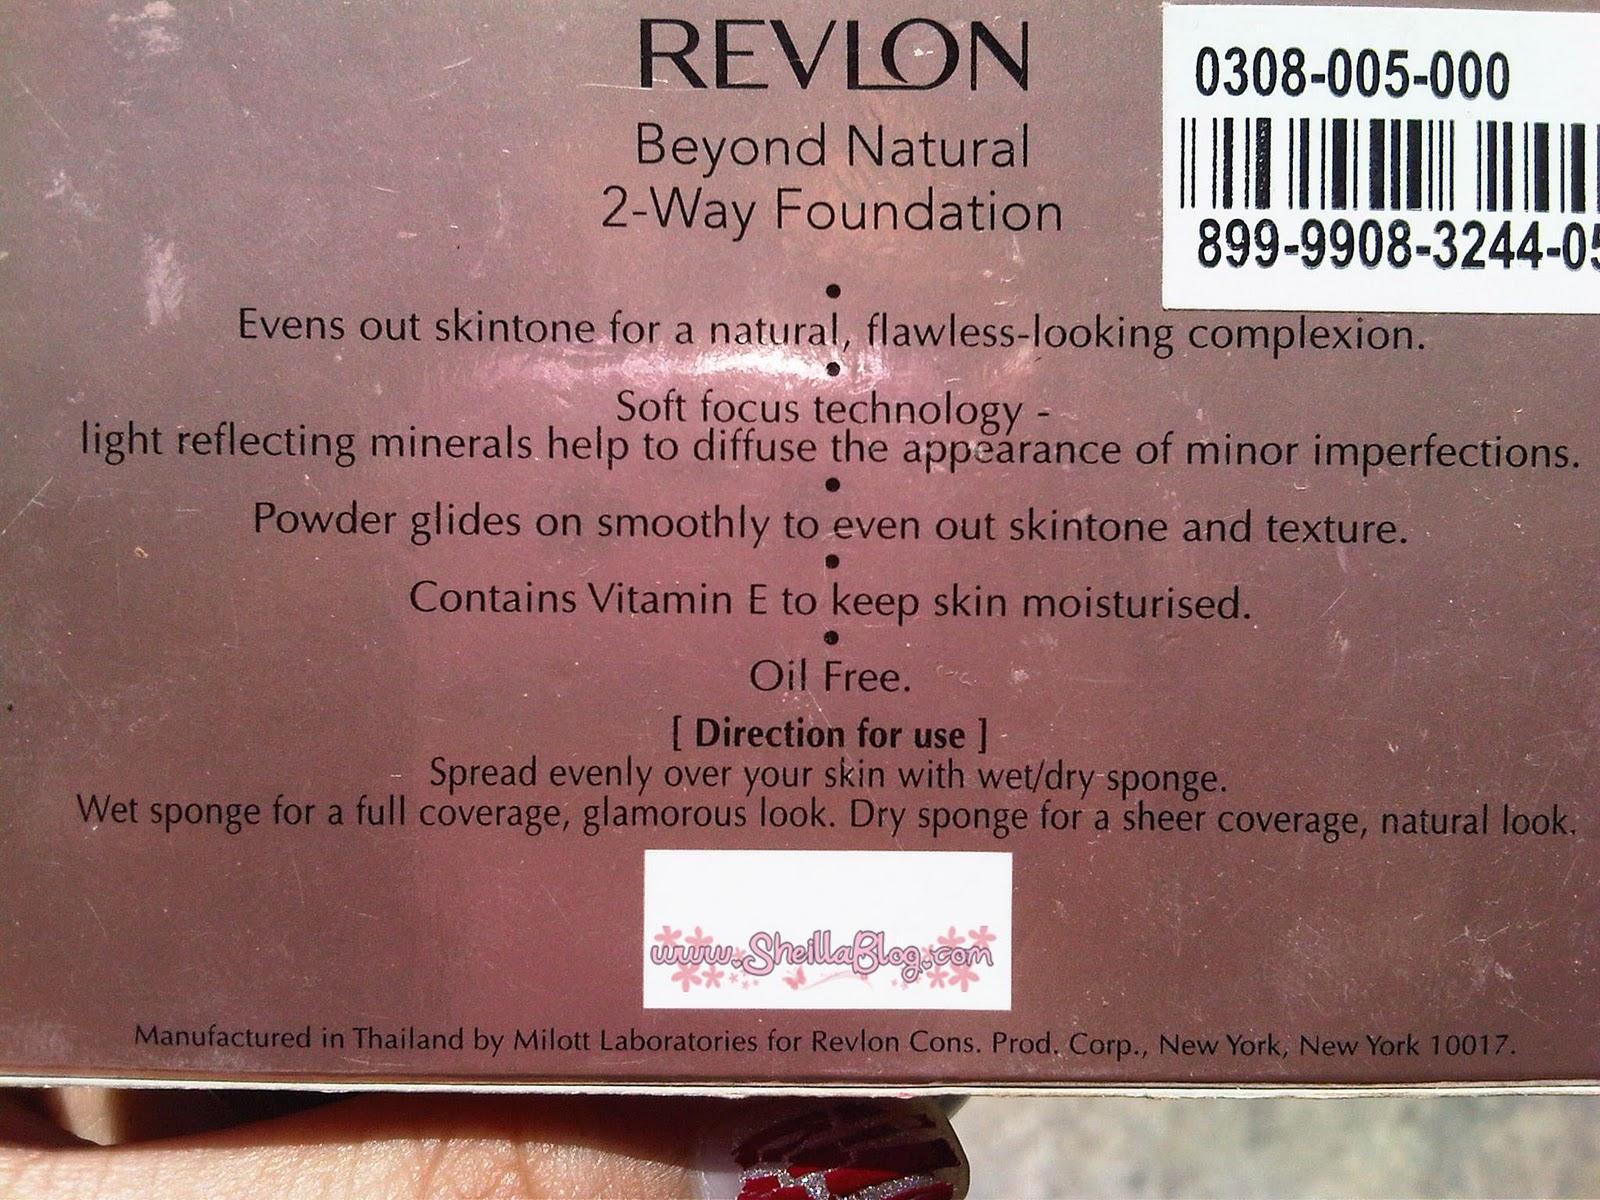 Revlon Beyond Natural Smoothing Primer Review Indonesia